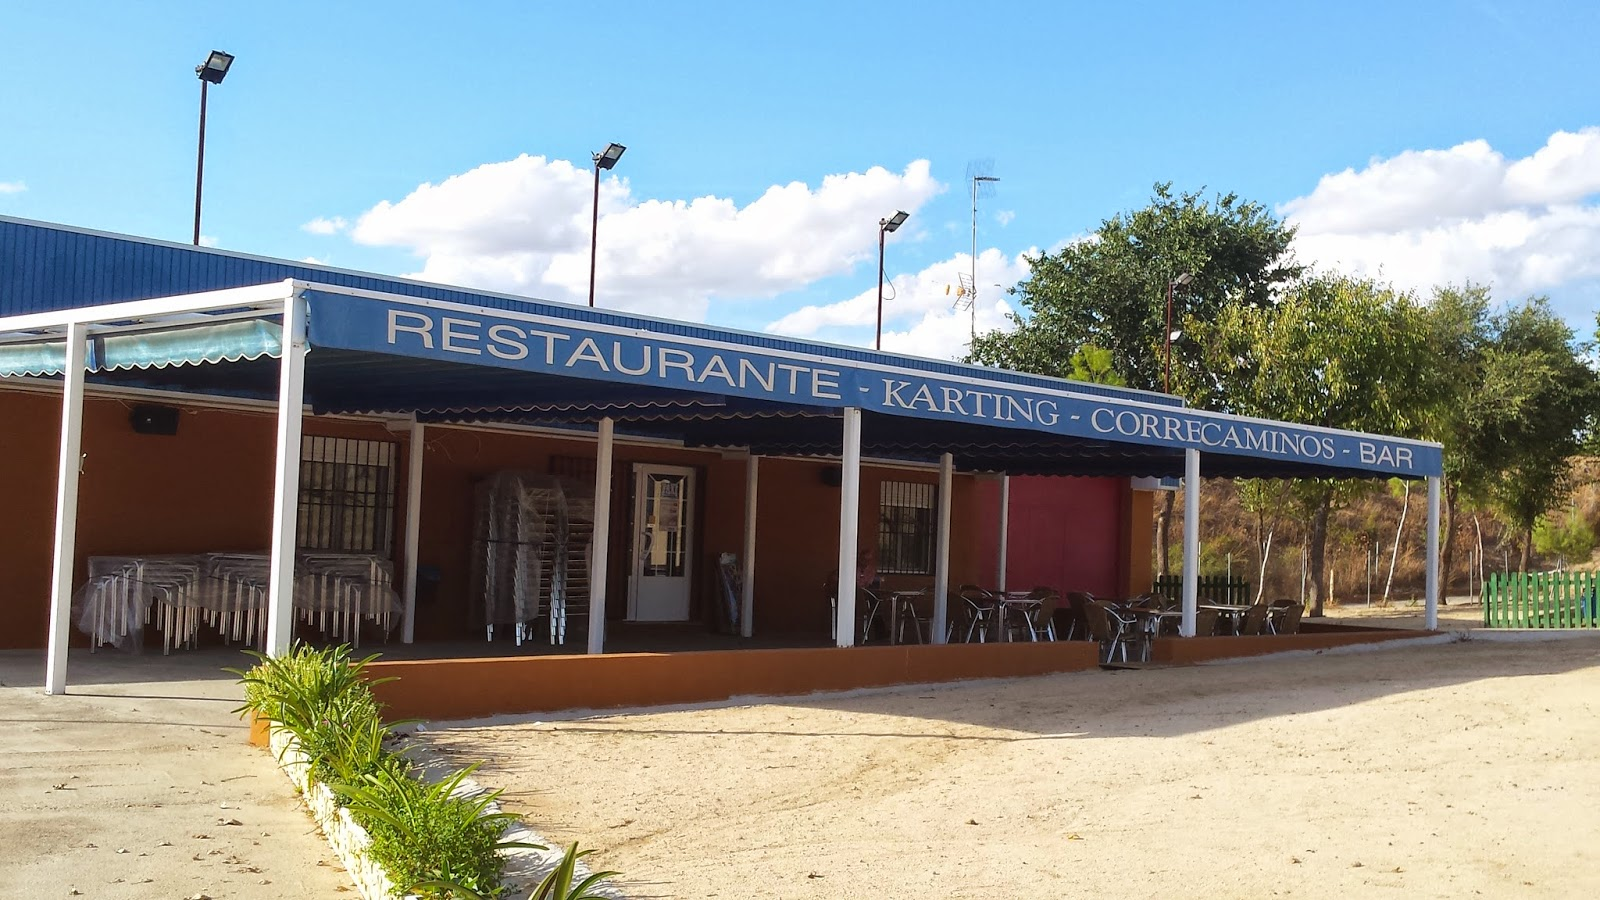 restaurante-correcaminos-9